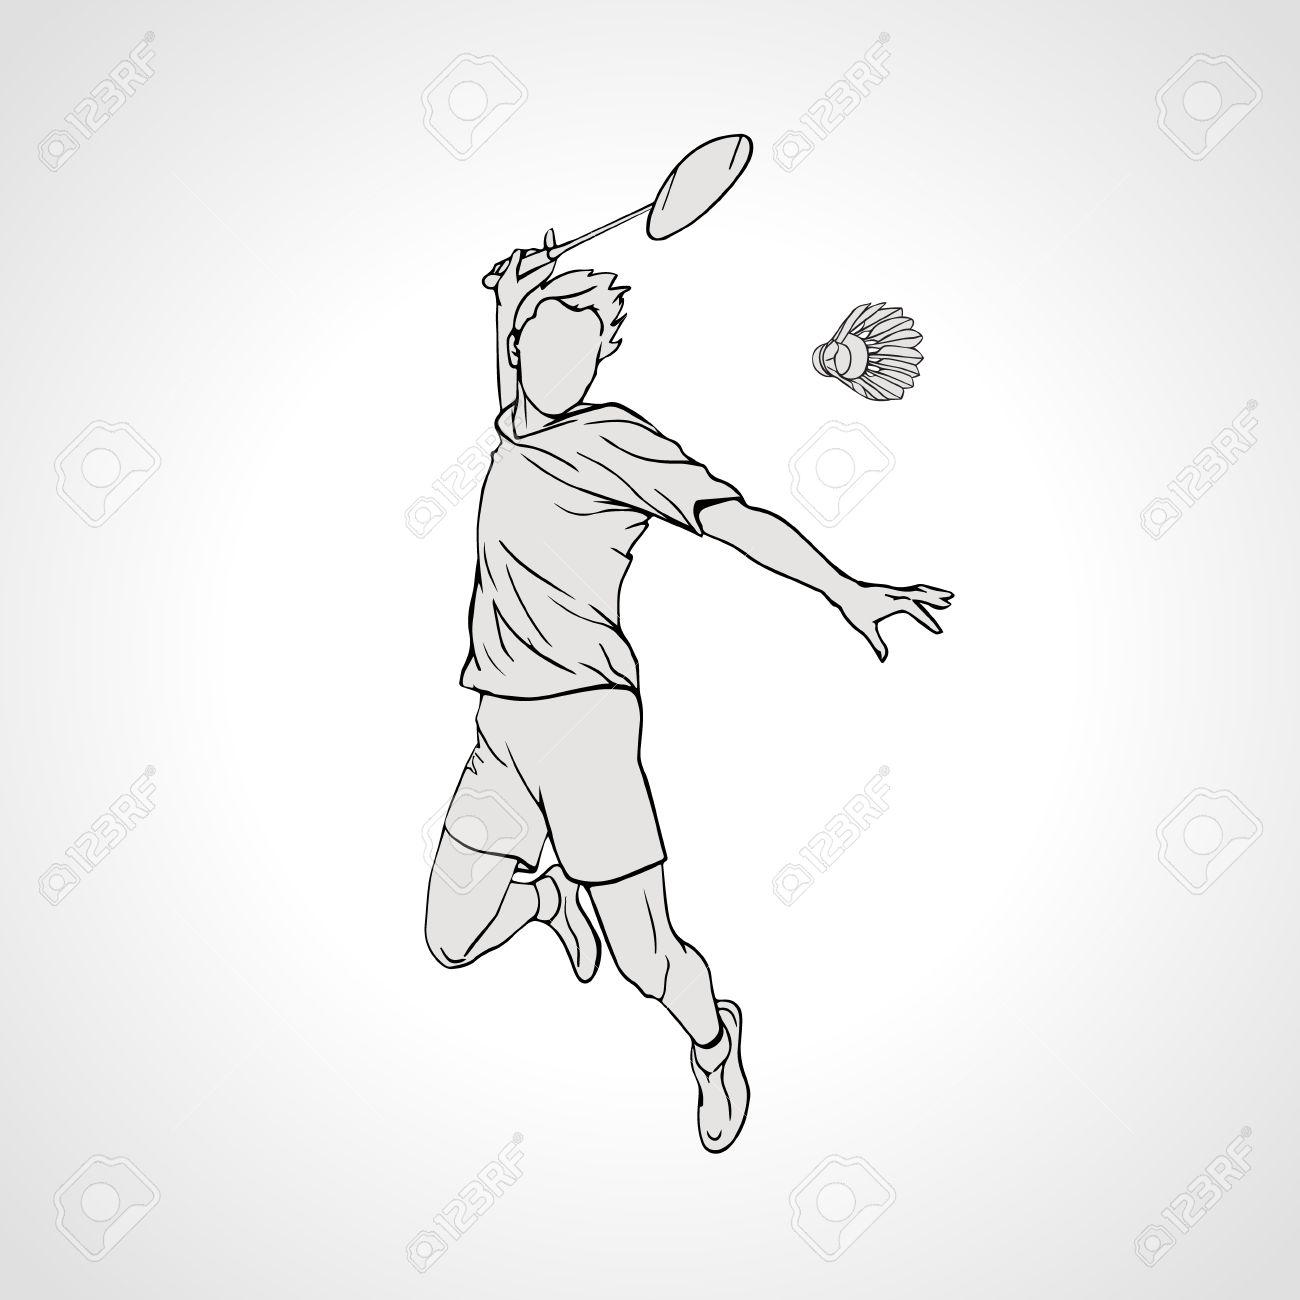 Vector illustration of Badminton player. Black and white badminton player during smash shot. Hand drawn. - 49137422